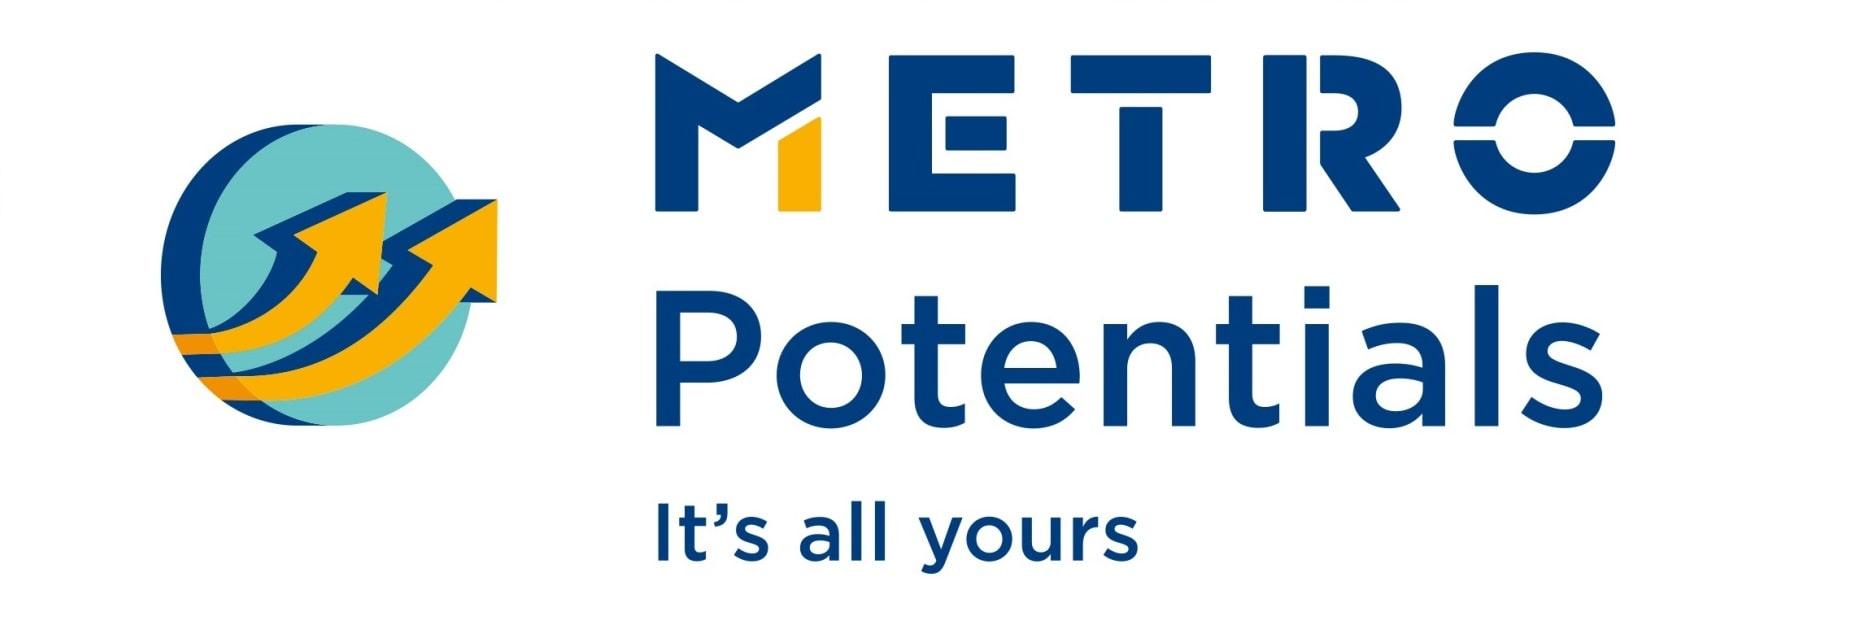 Metro potentials - angajari, cariera